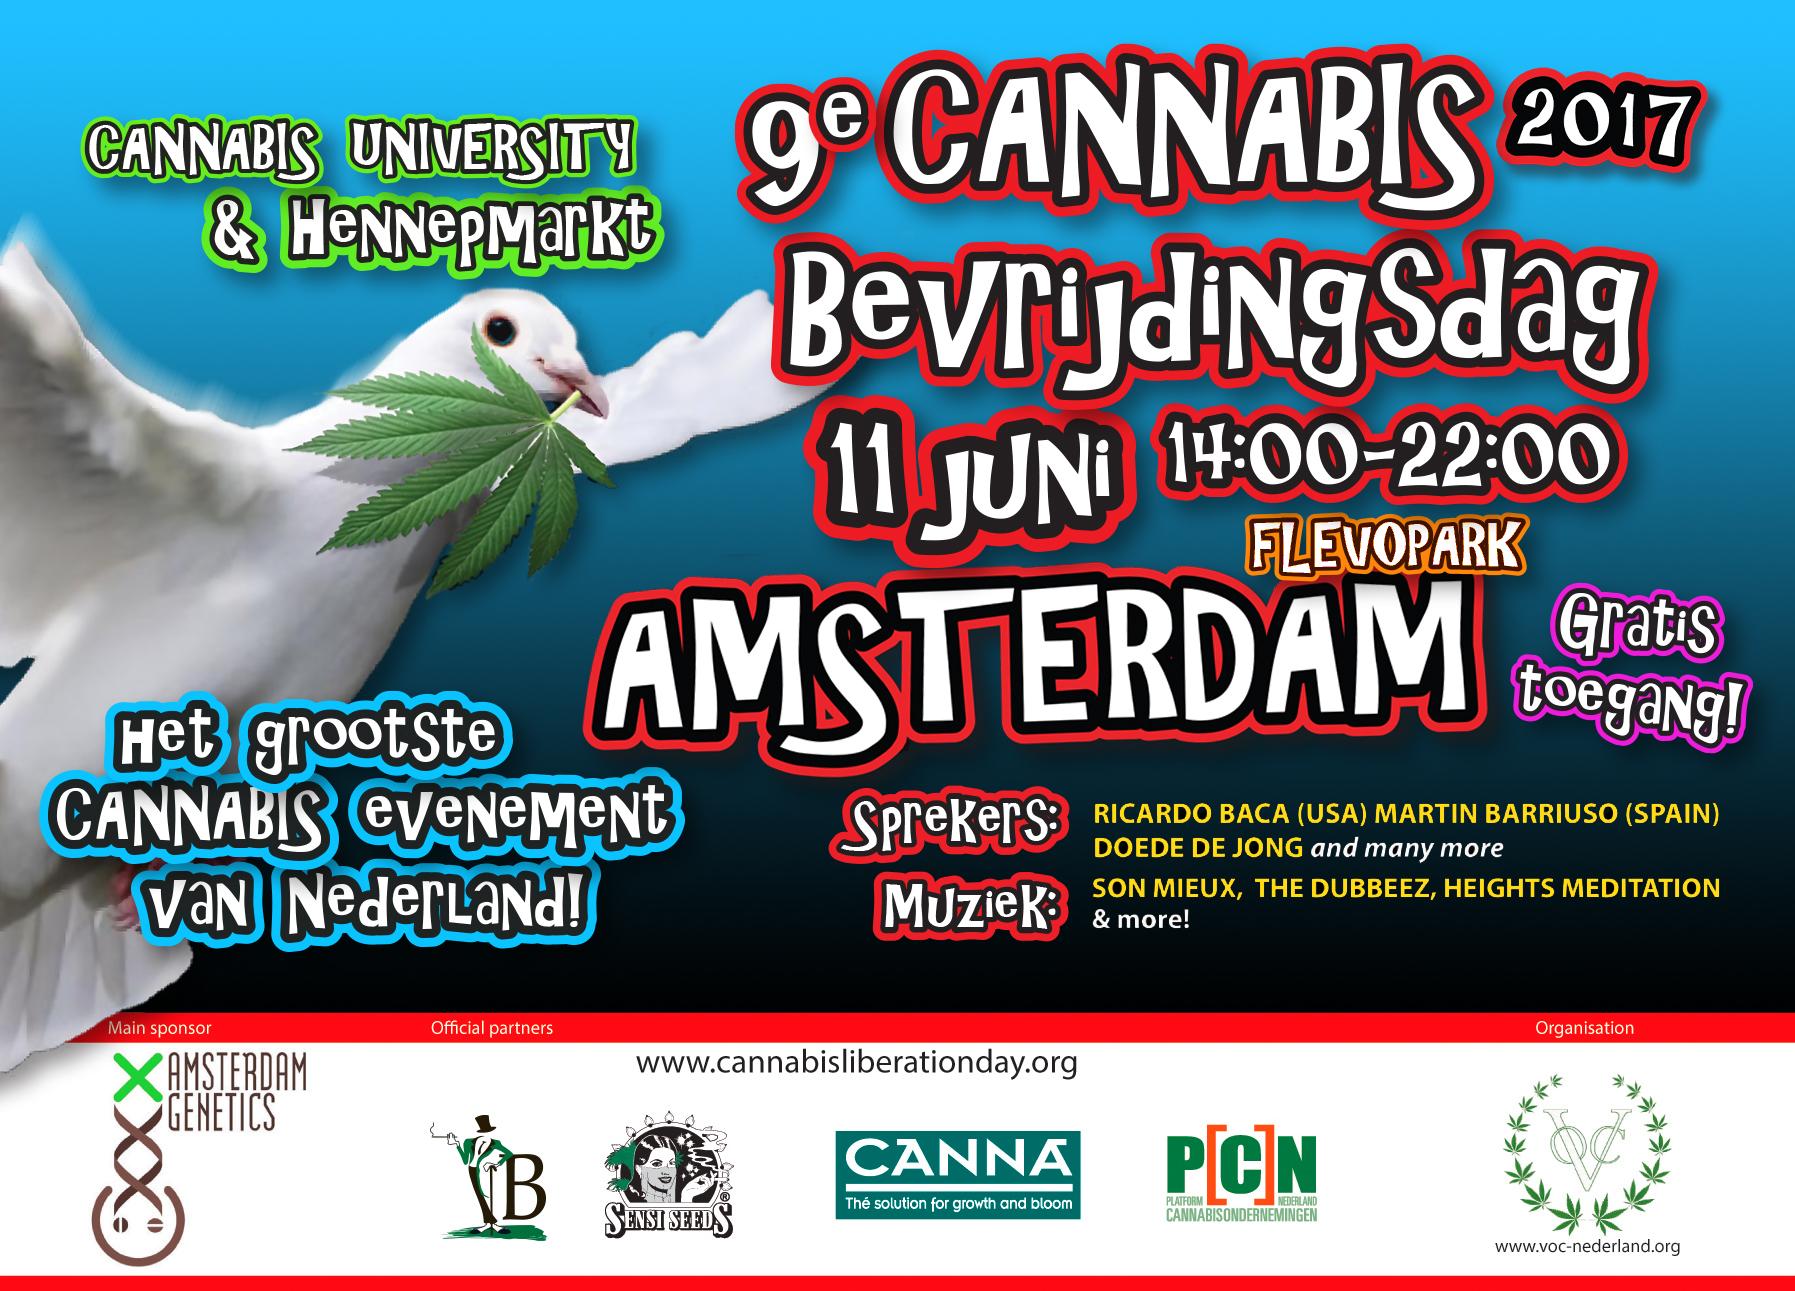 Cannabis Bevrijdingsdag 2017